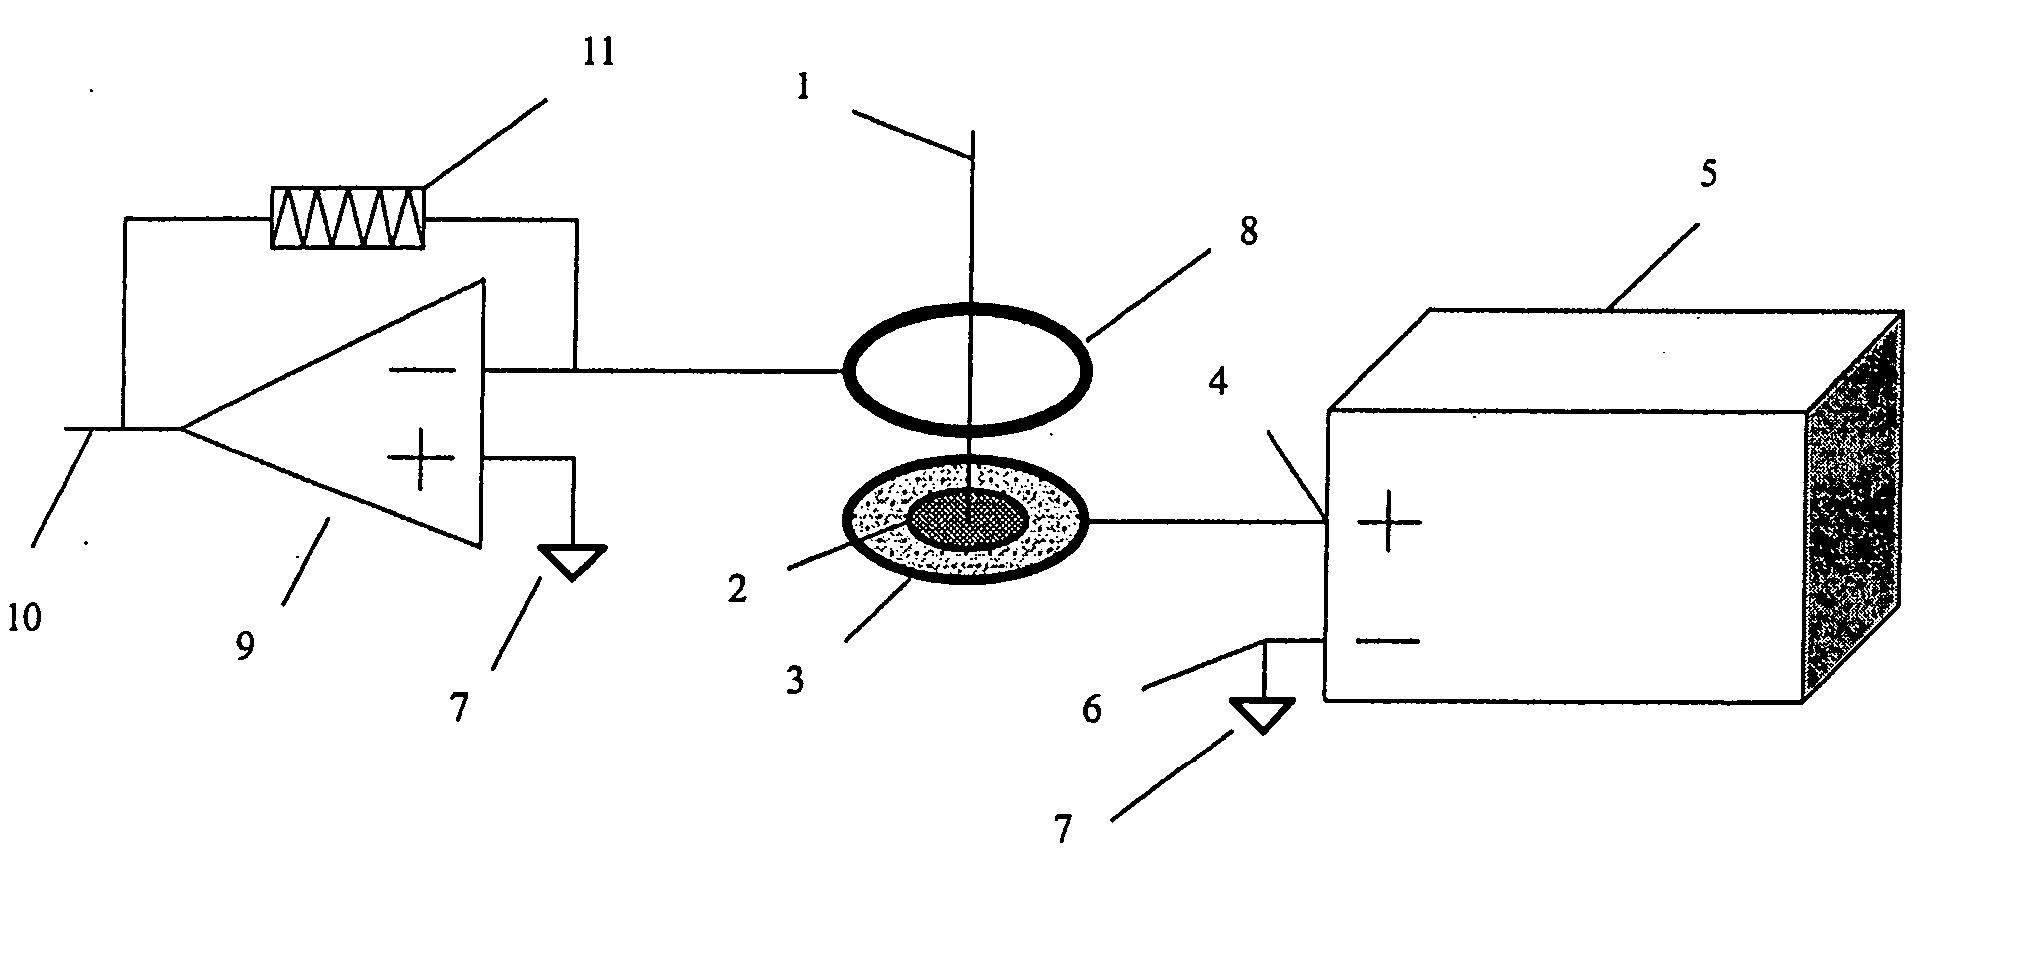 patent us20050061779 - laser ablation feedback spectroscopy